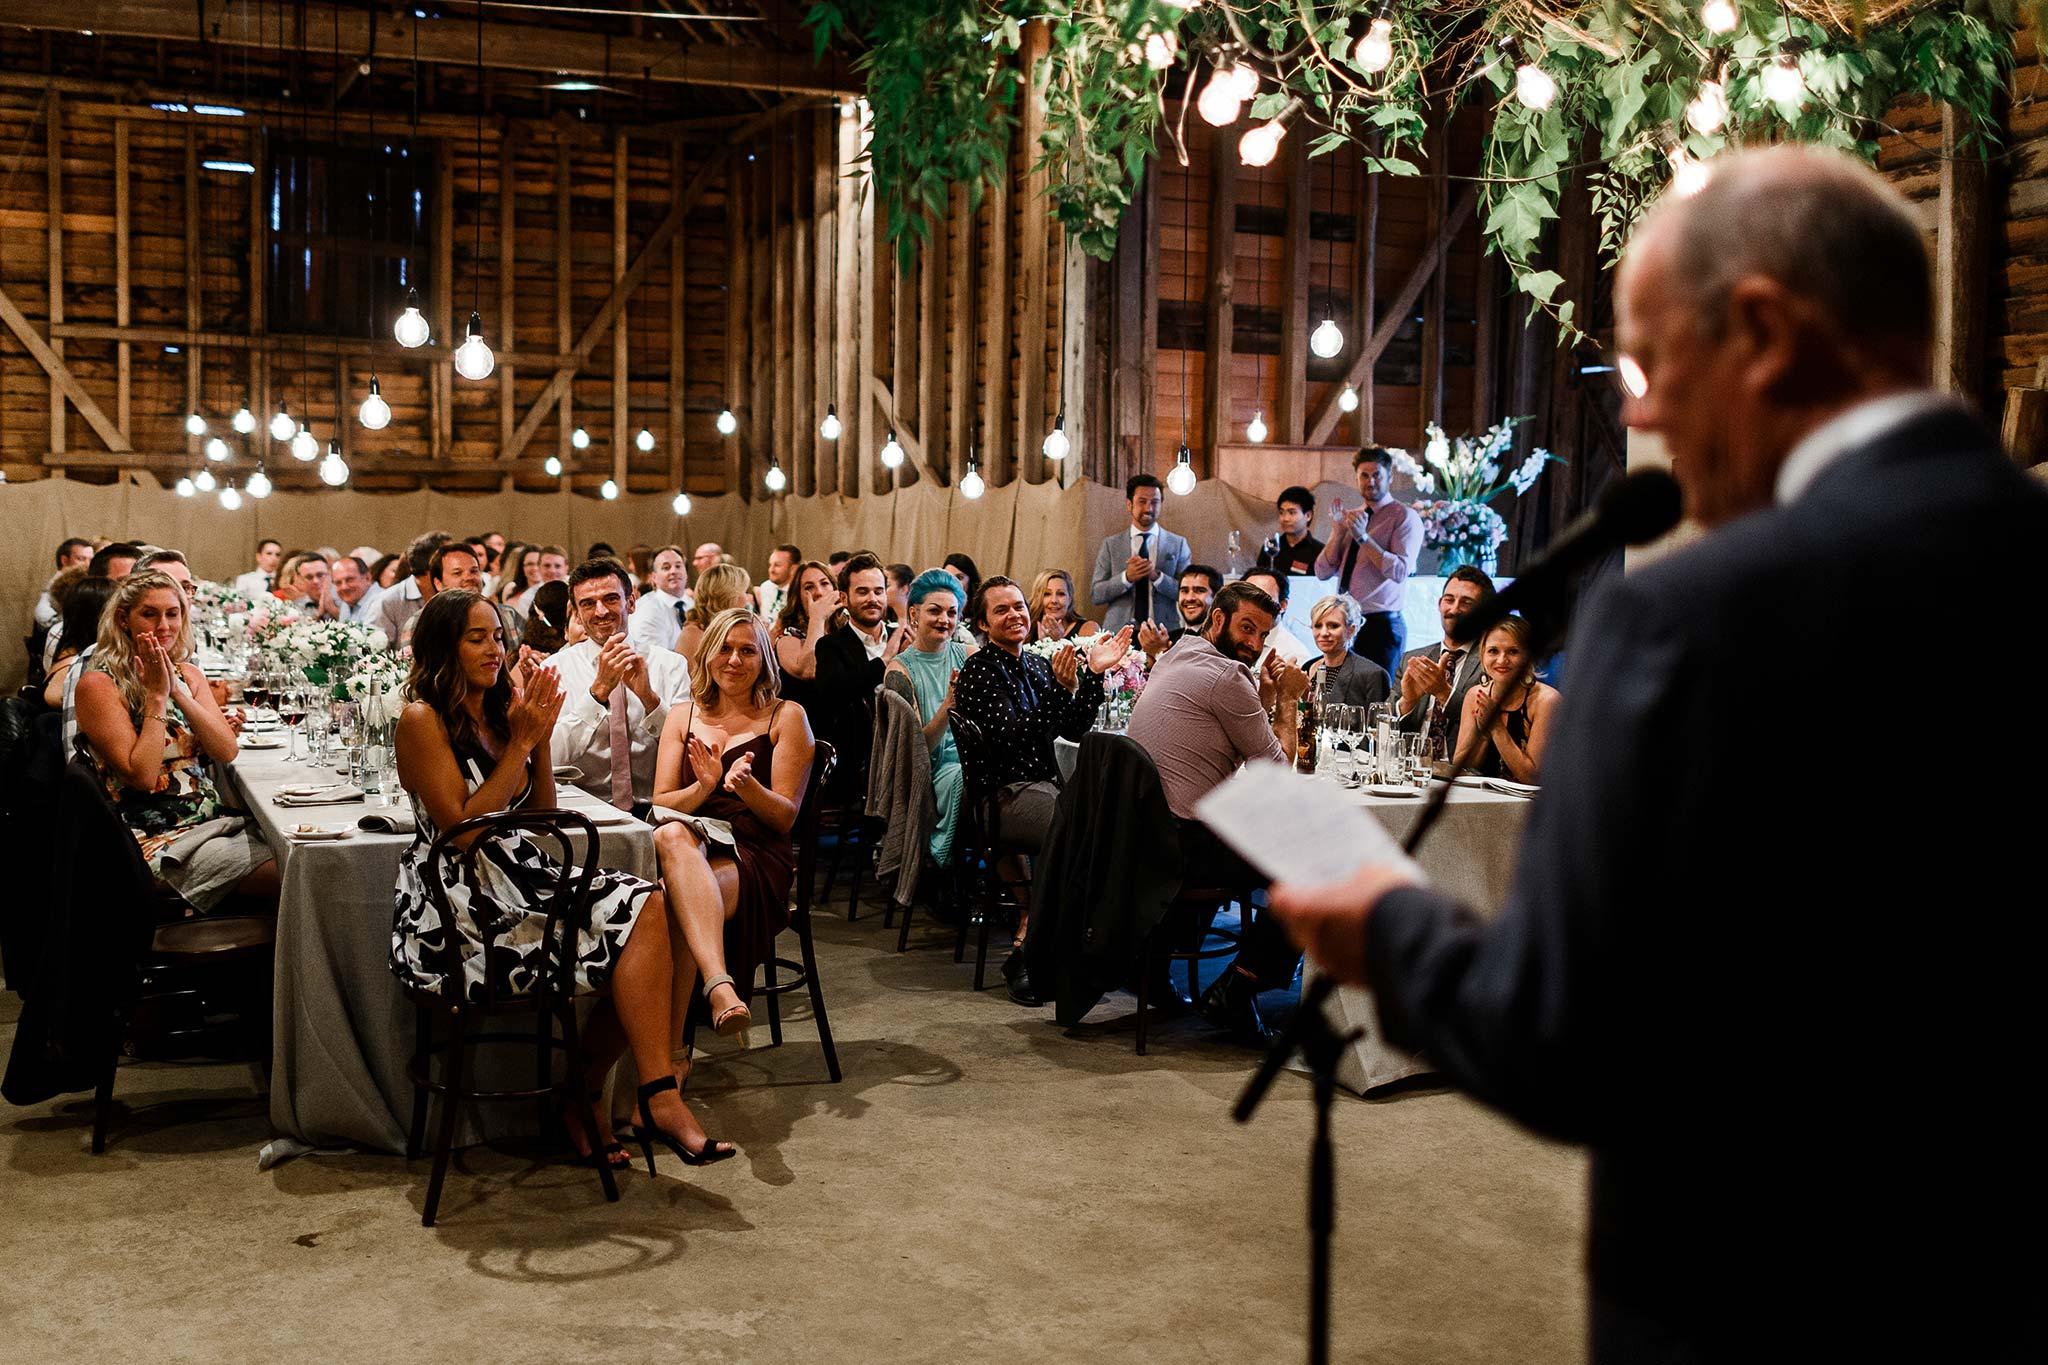 Launceston-Brickendon-barn-Wedding-Photographer-reception-dad-speech